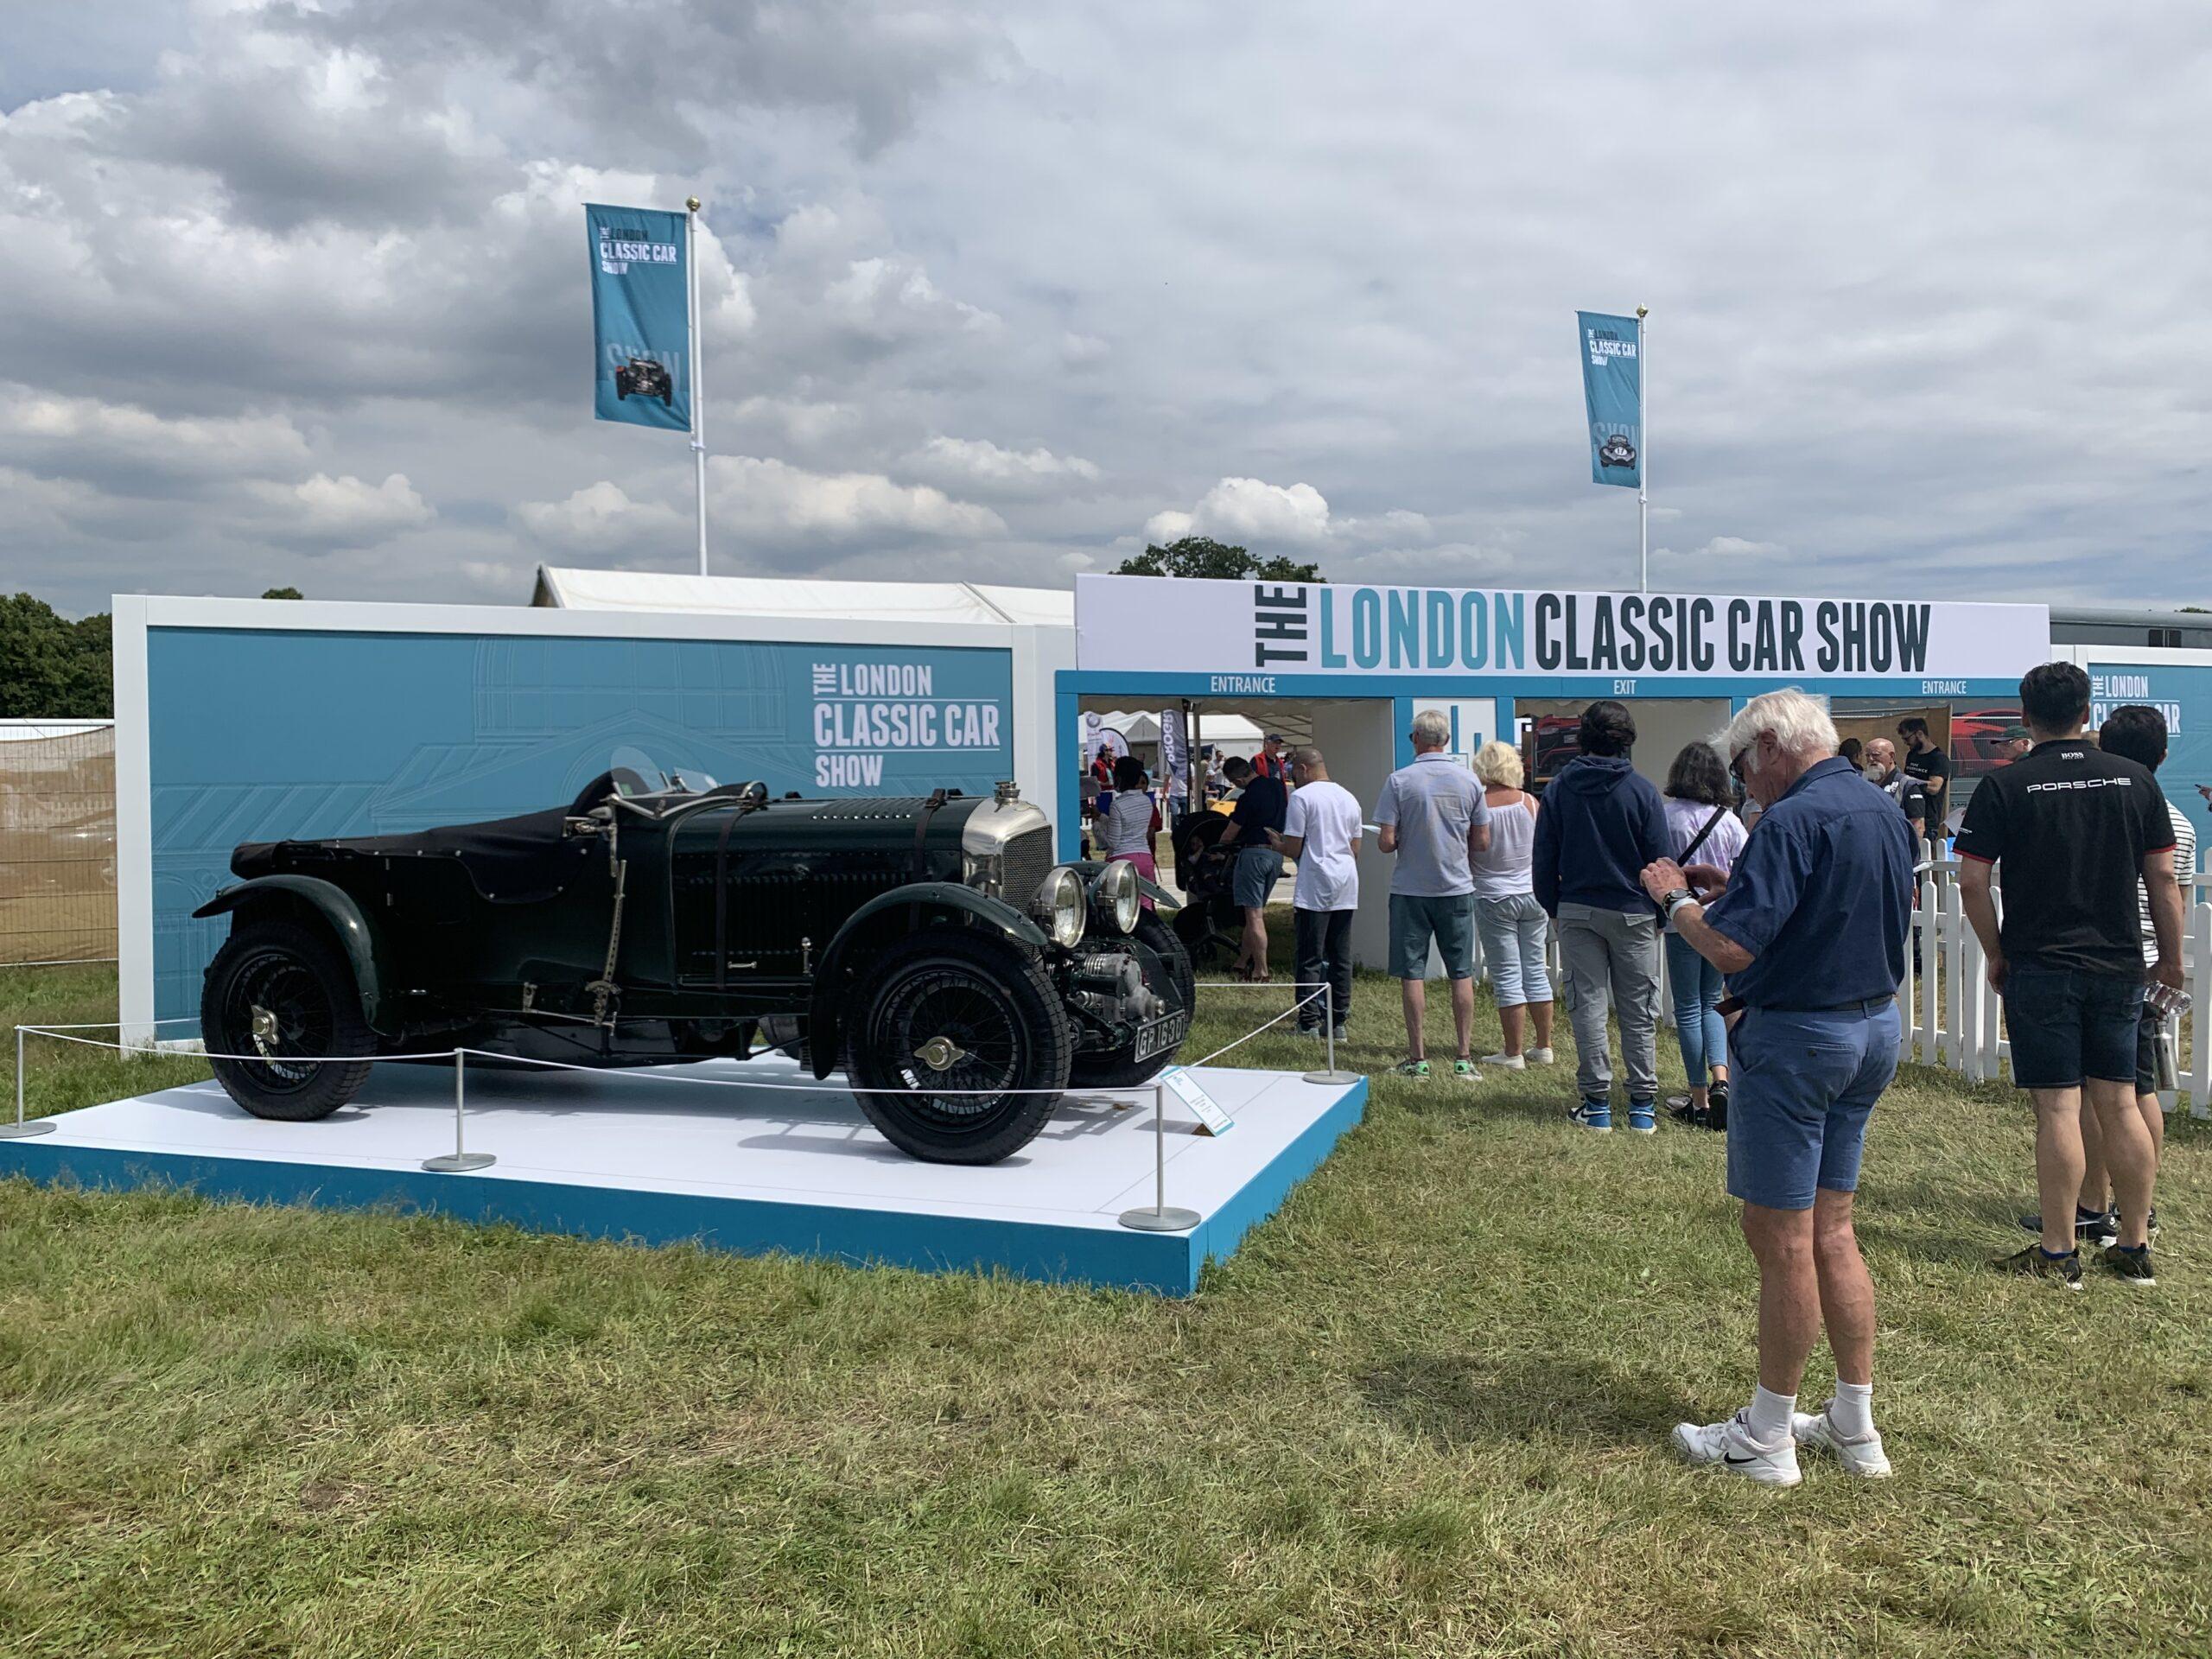 London Classic Car Show 2021